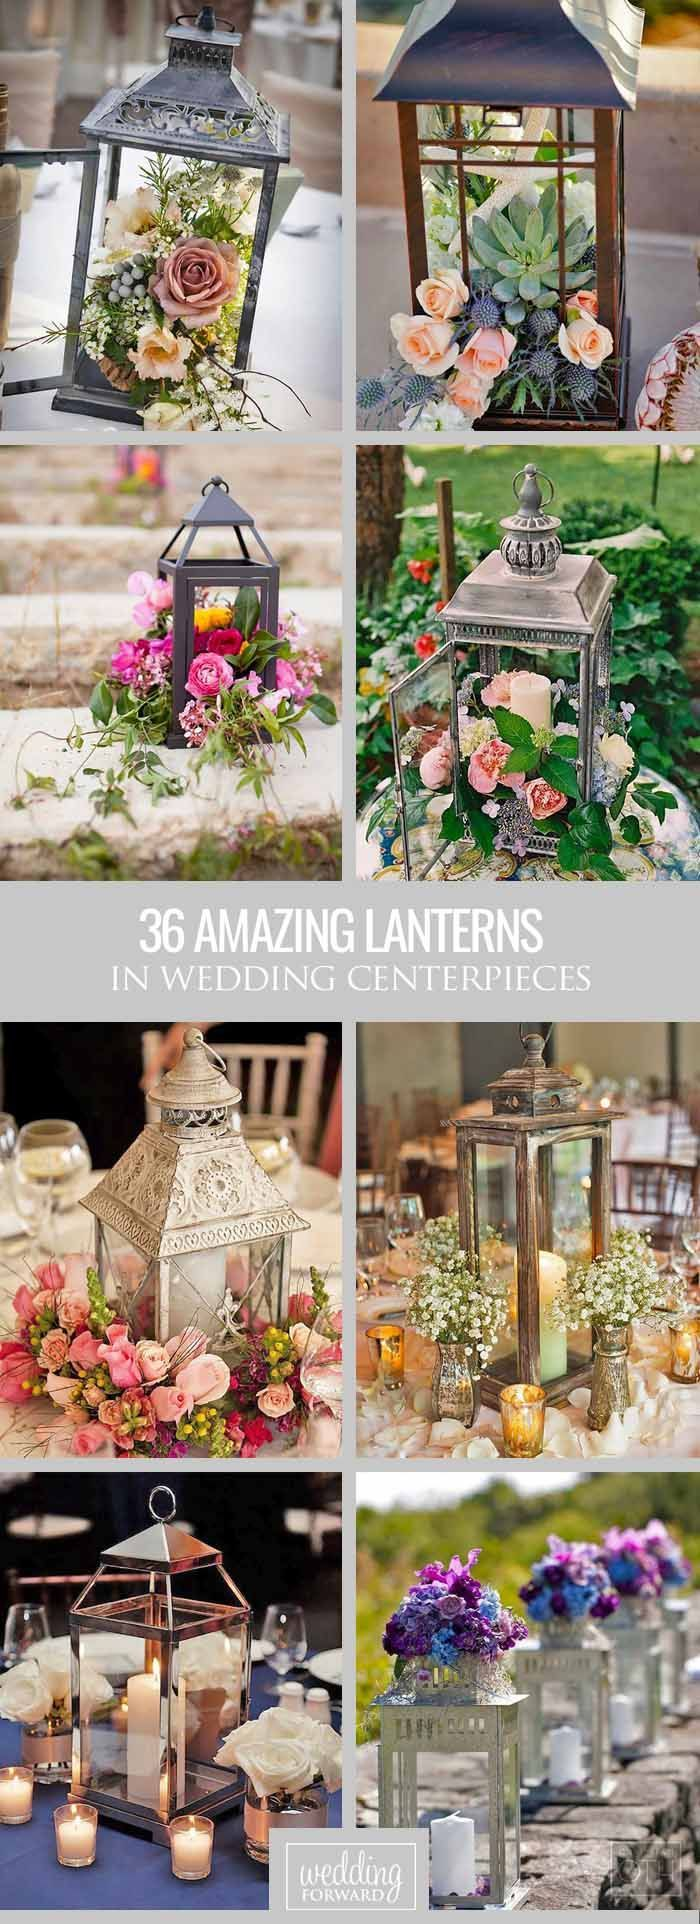 36 Amazing Lantern Wedding Centerpiece Ideas ❤ We propose to consider lantern wedding centerpiece ideas with candles or beautiful flowers inside. See more: http://www.weddingforward.com/lantern-wedding-centerpiece-ideas/ #weddings #decoration